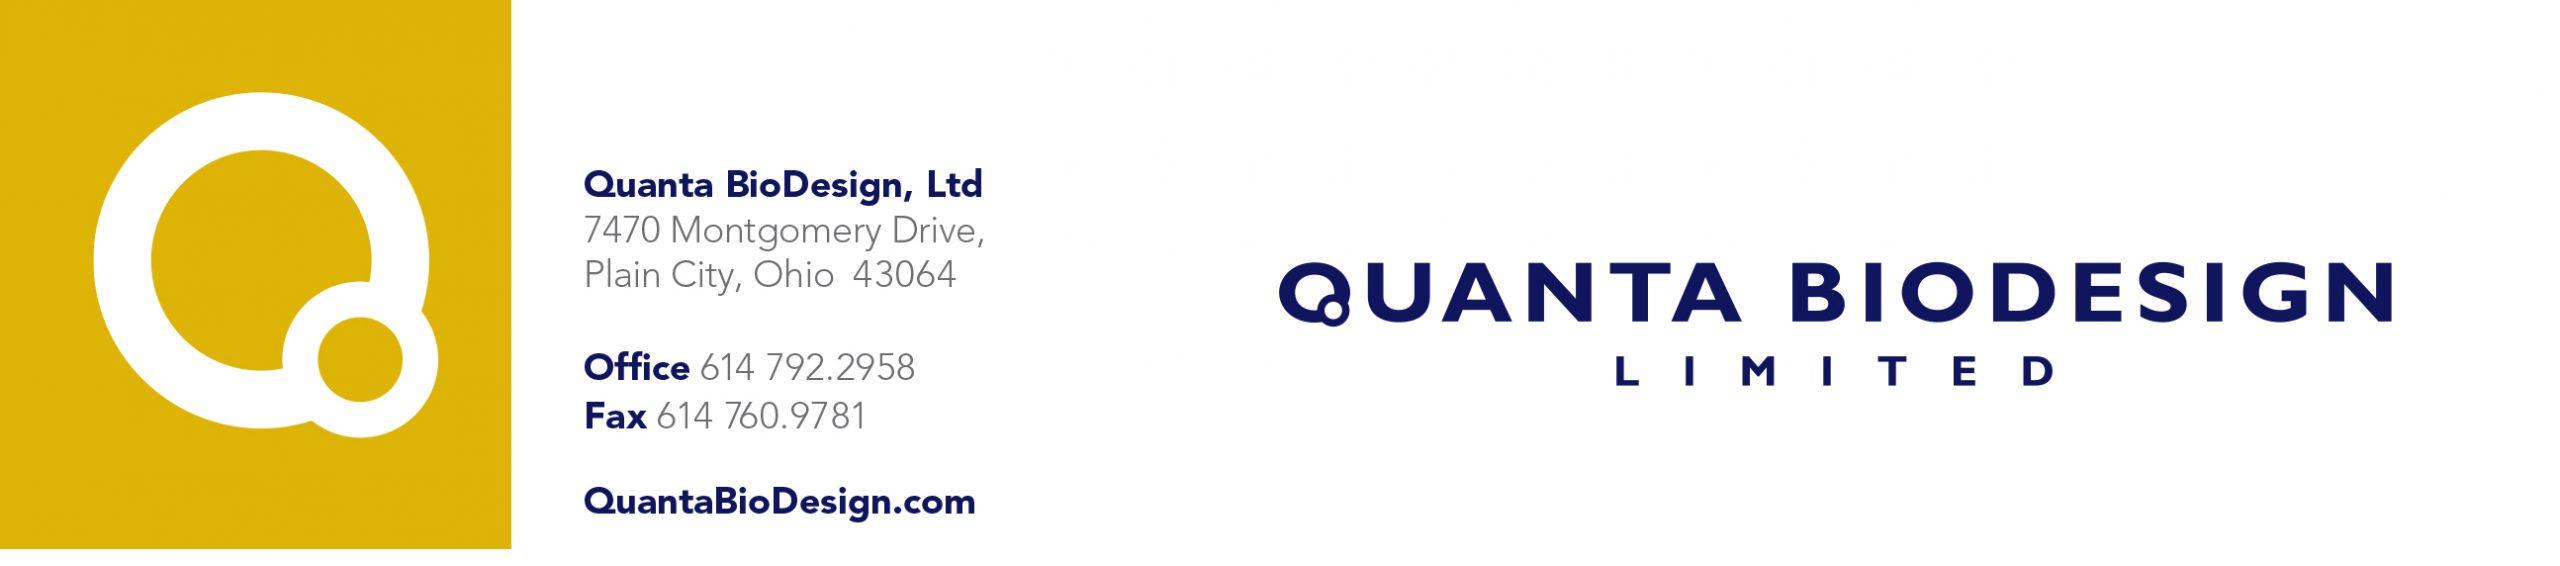 Quanta BioDesign, Ltd. Letterhead